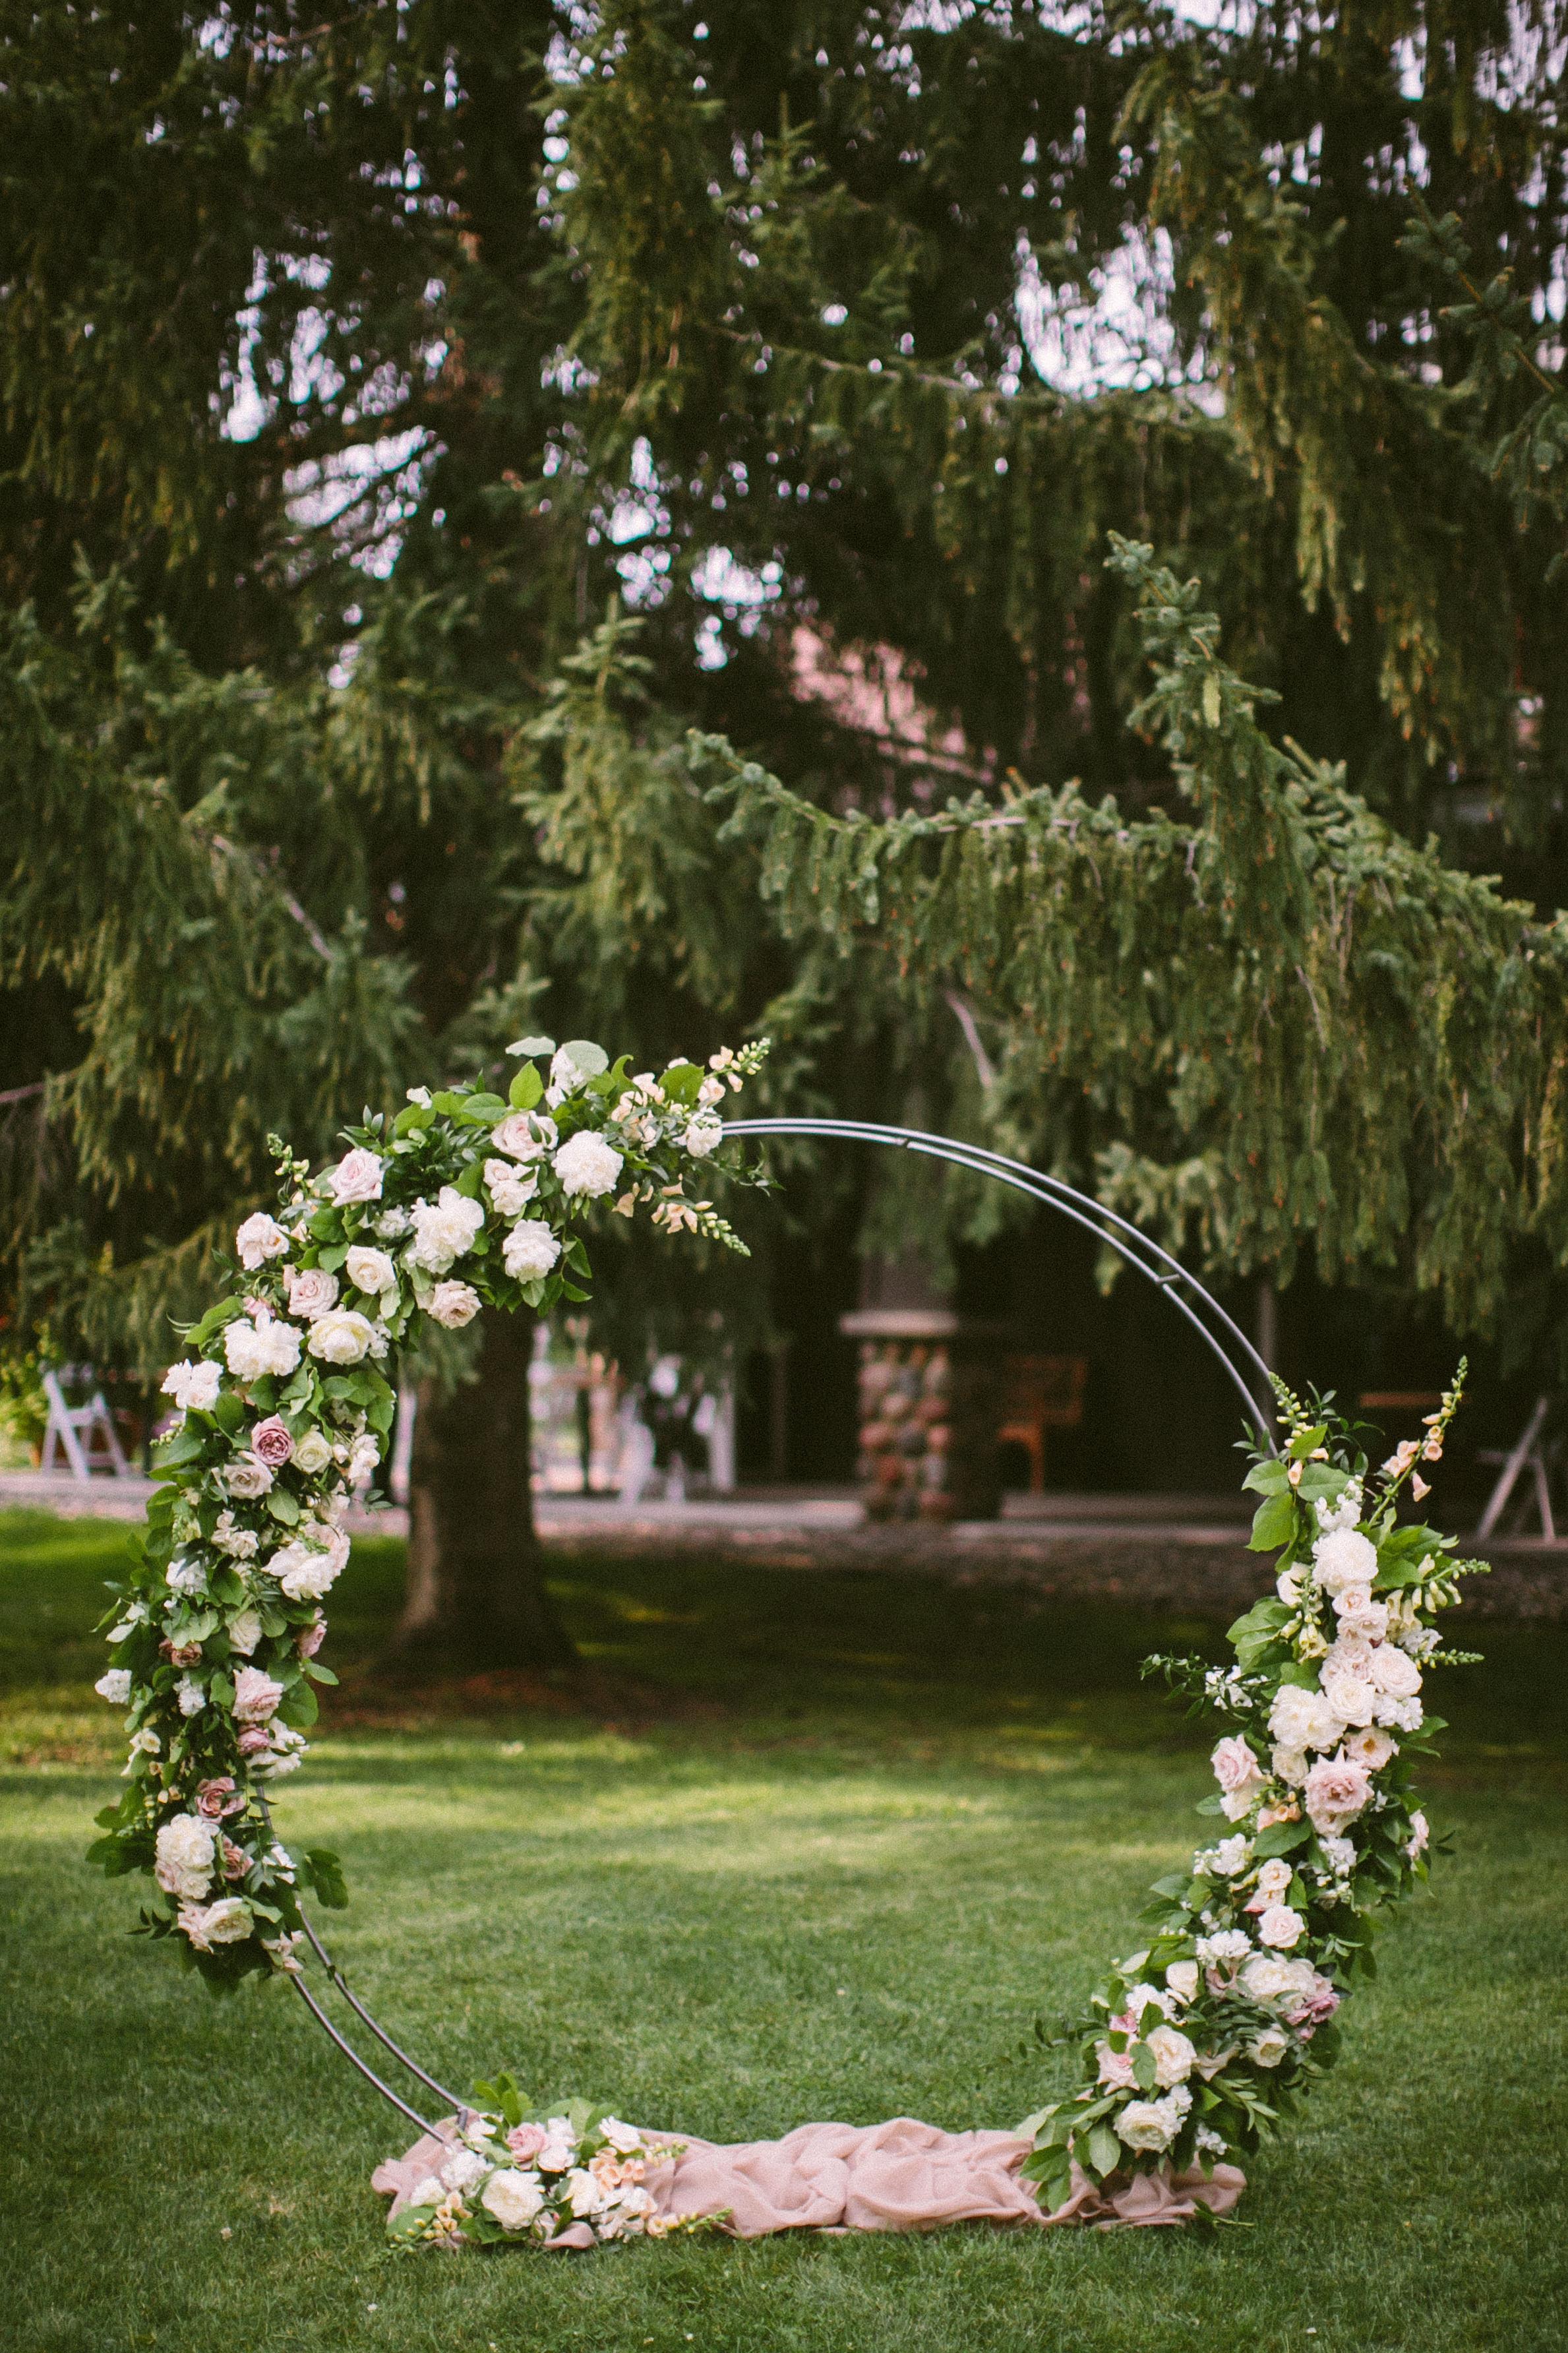 Farmhouse Foundry Circle Steel Arch Bloom Designs Grand View Lodge Wedding Rental.jpg